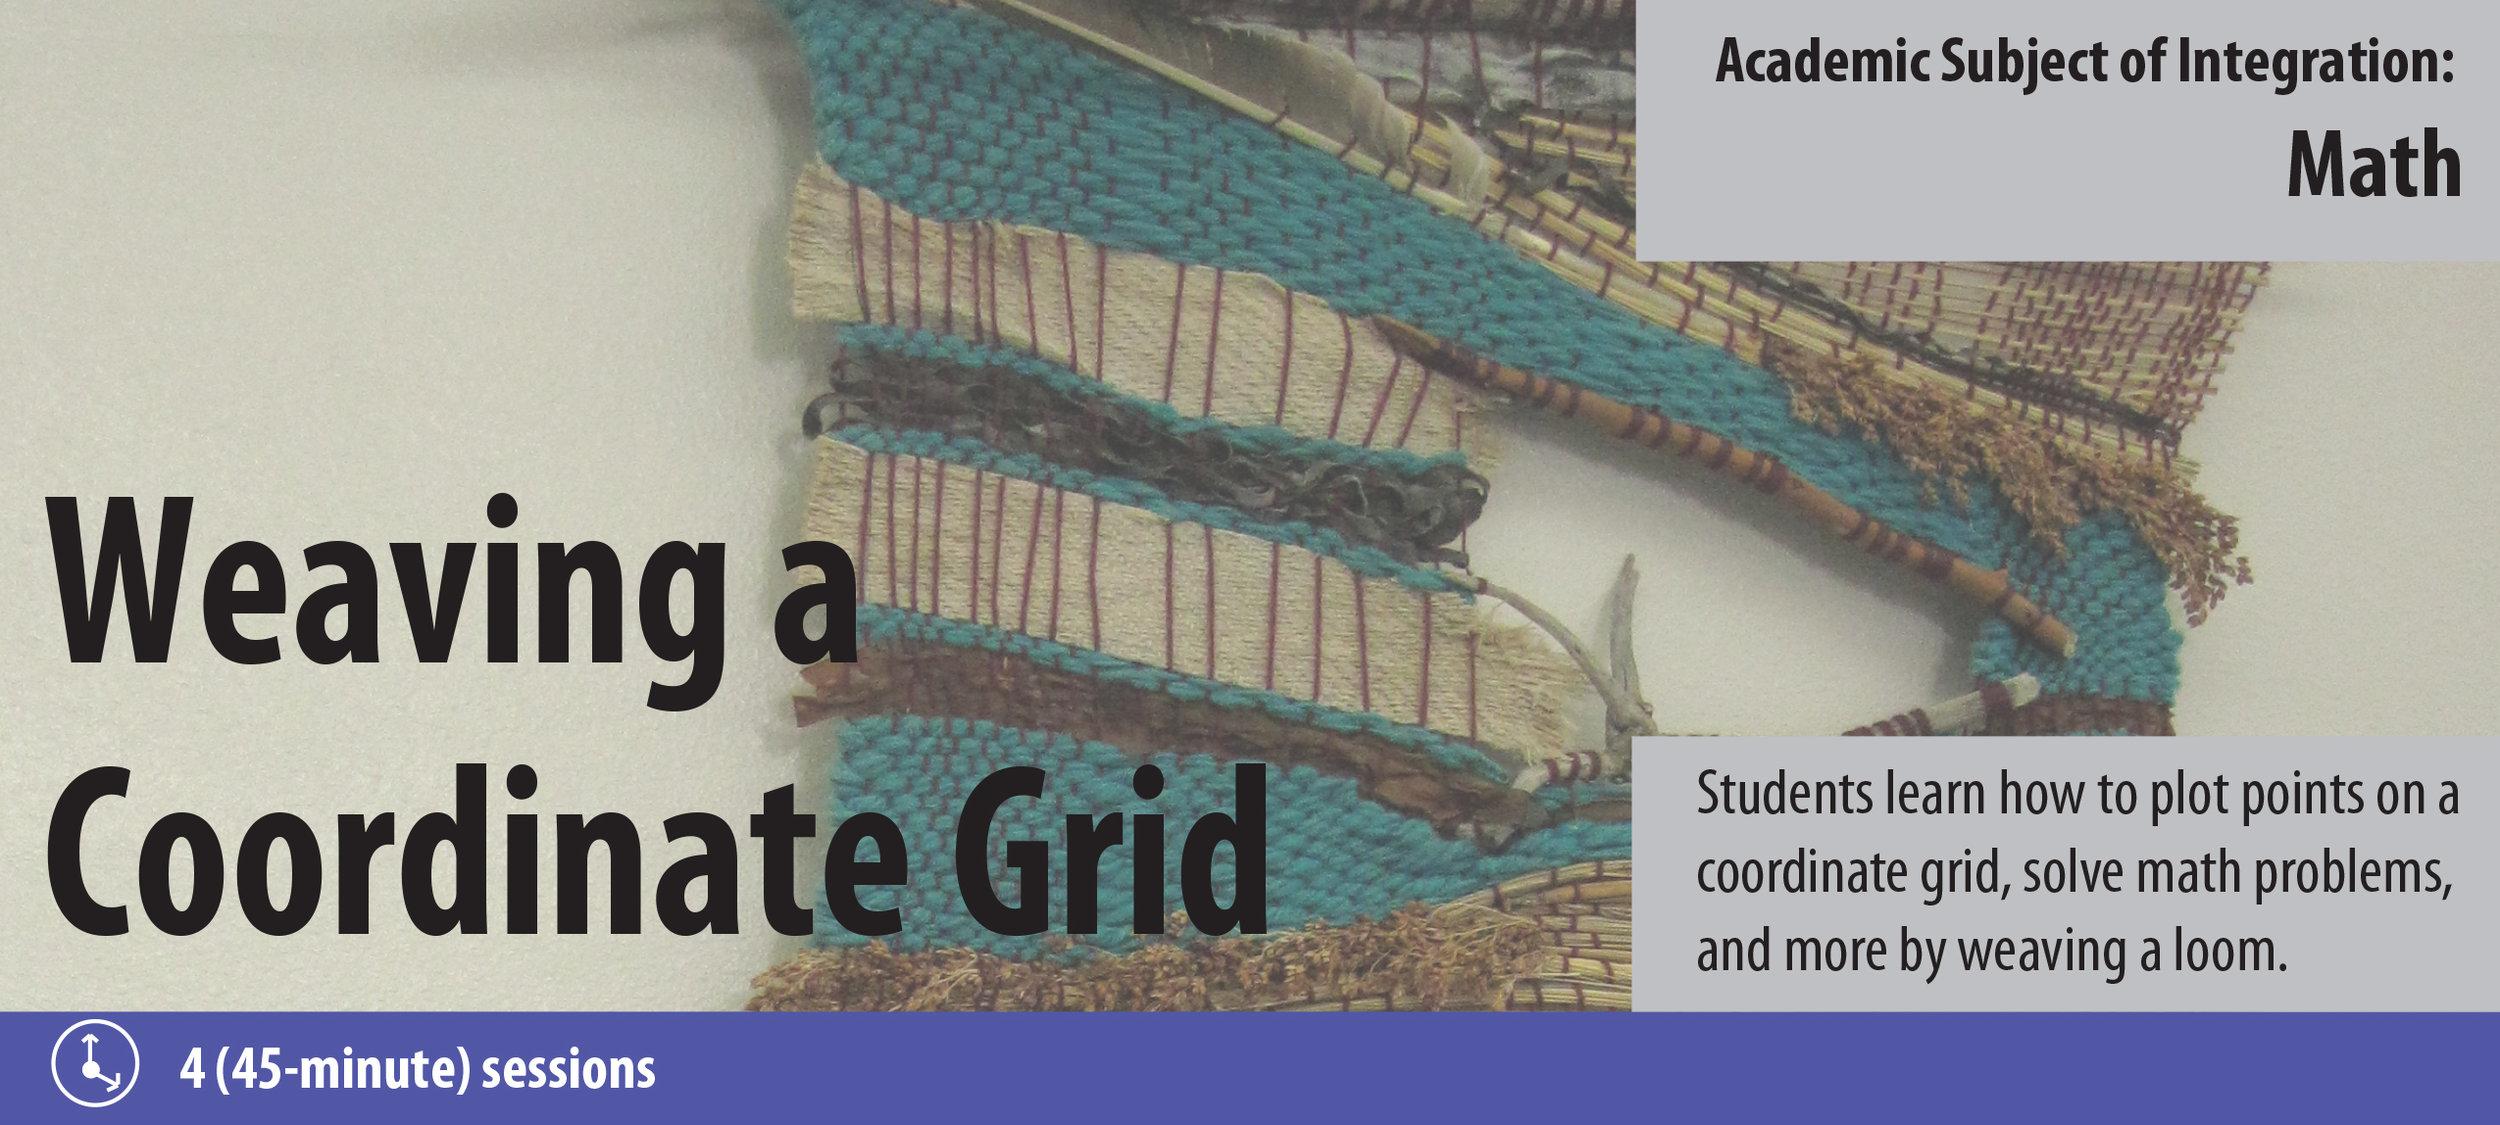 Weaving a Coordinate Grid_Action Plan_Header.jpg